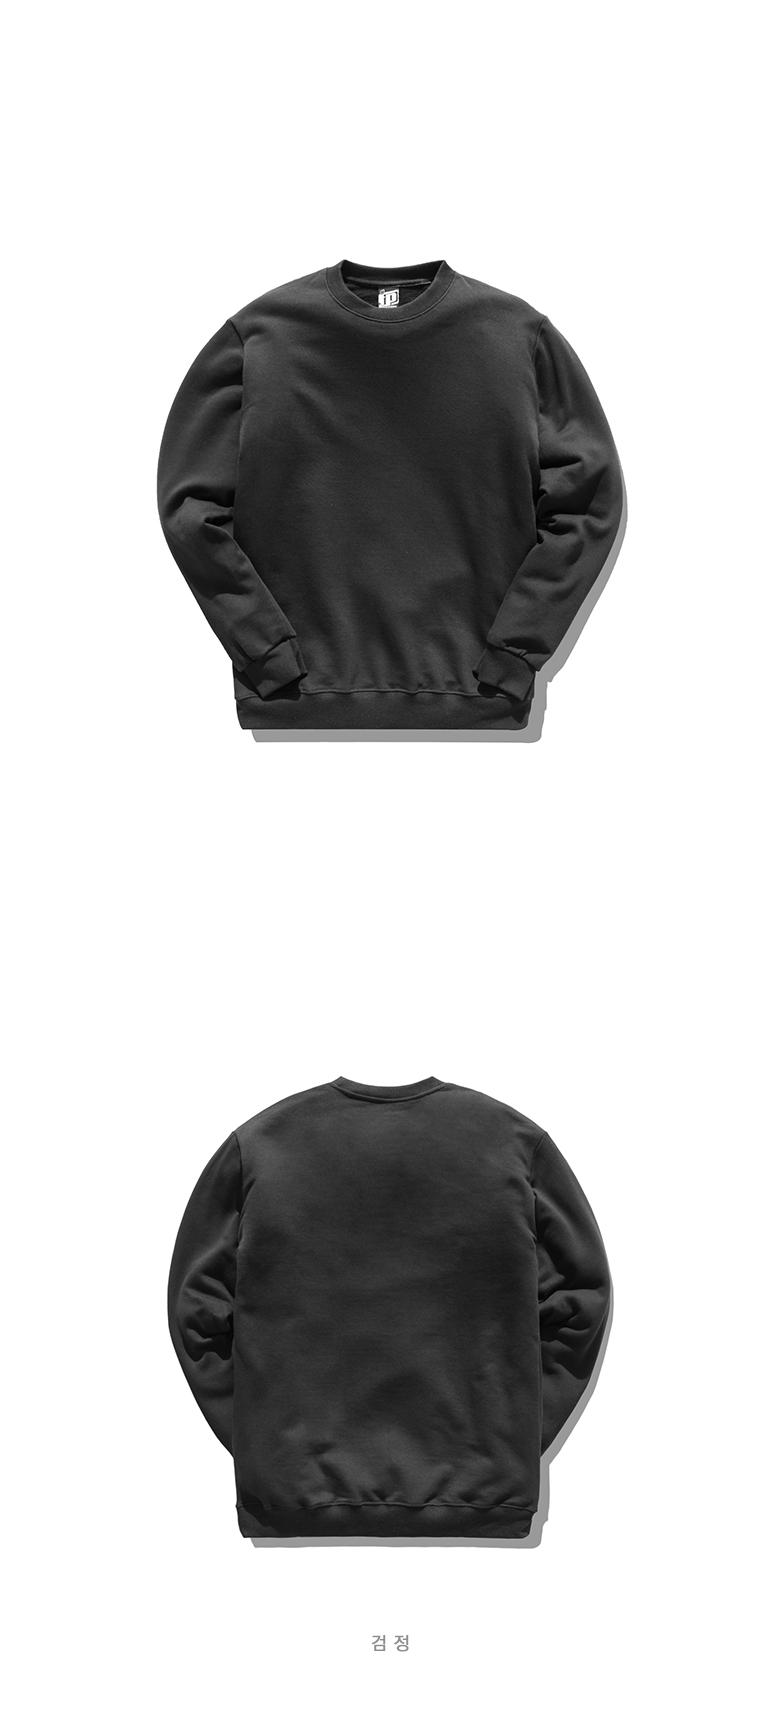 20180912_fp_pigment_sweatshirt_bk_uk_01.jpg